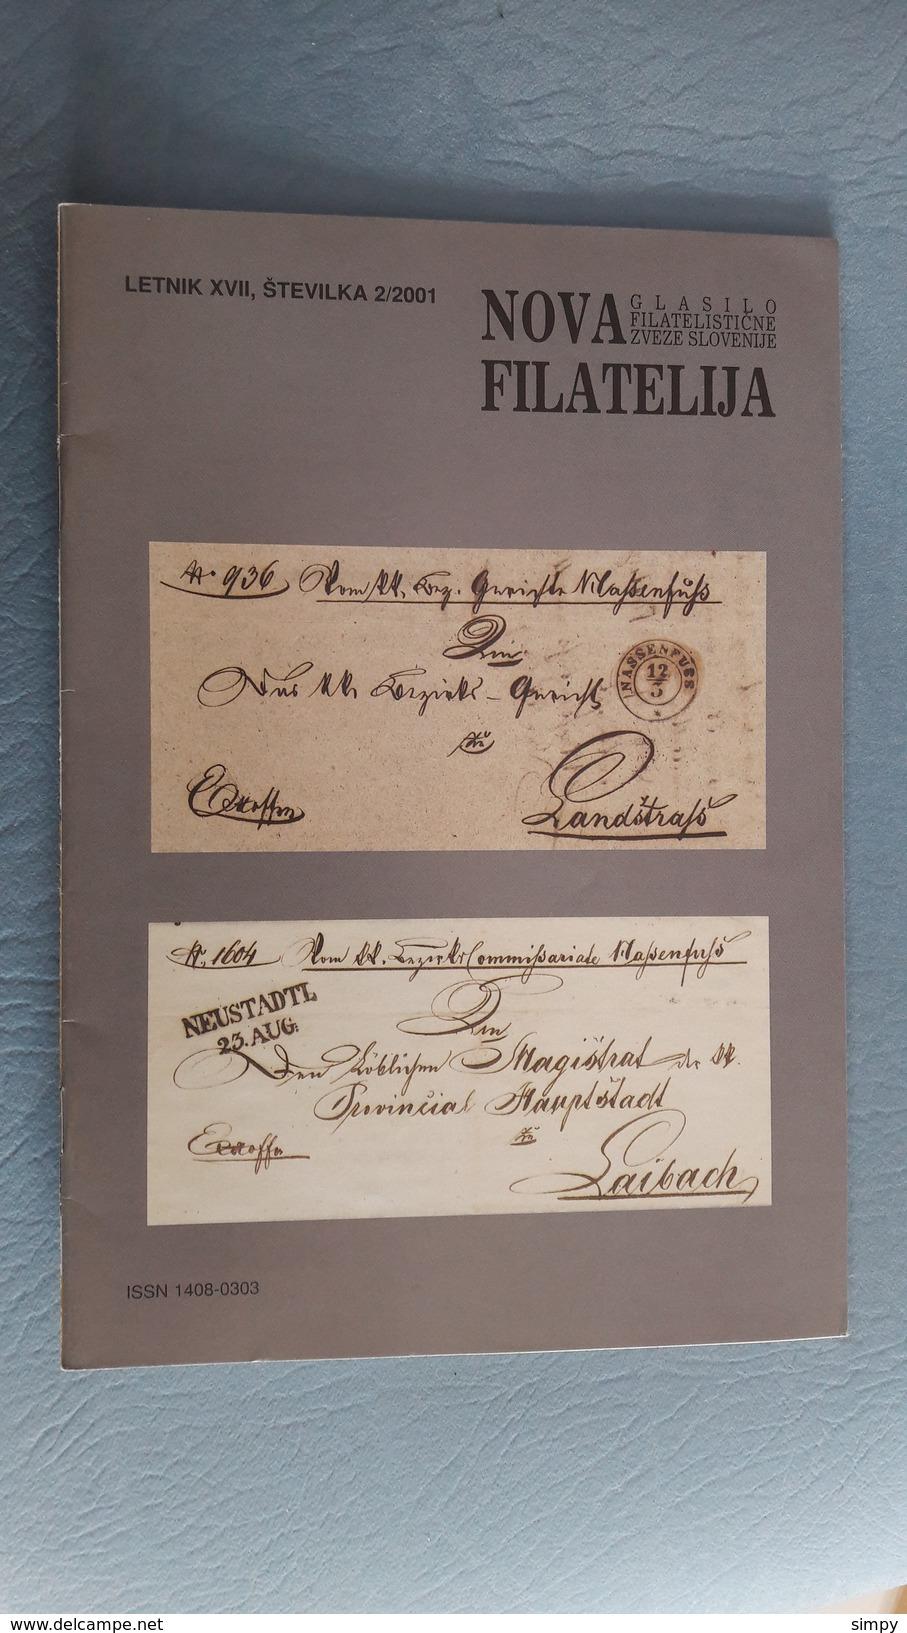 Slovenia - Philatelic Bulletin Nova Filatelija 2/2001 - Letteratura